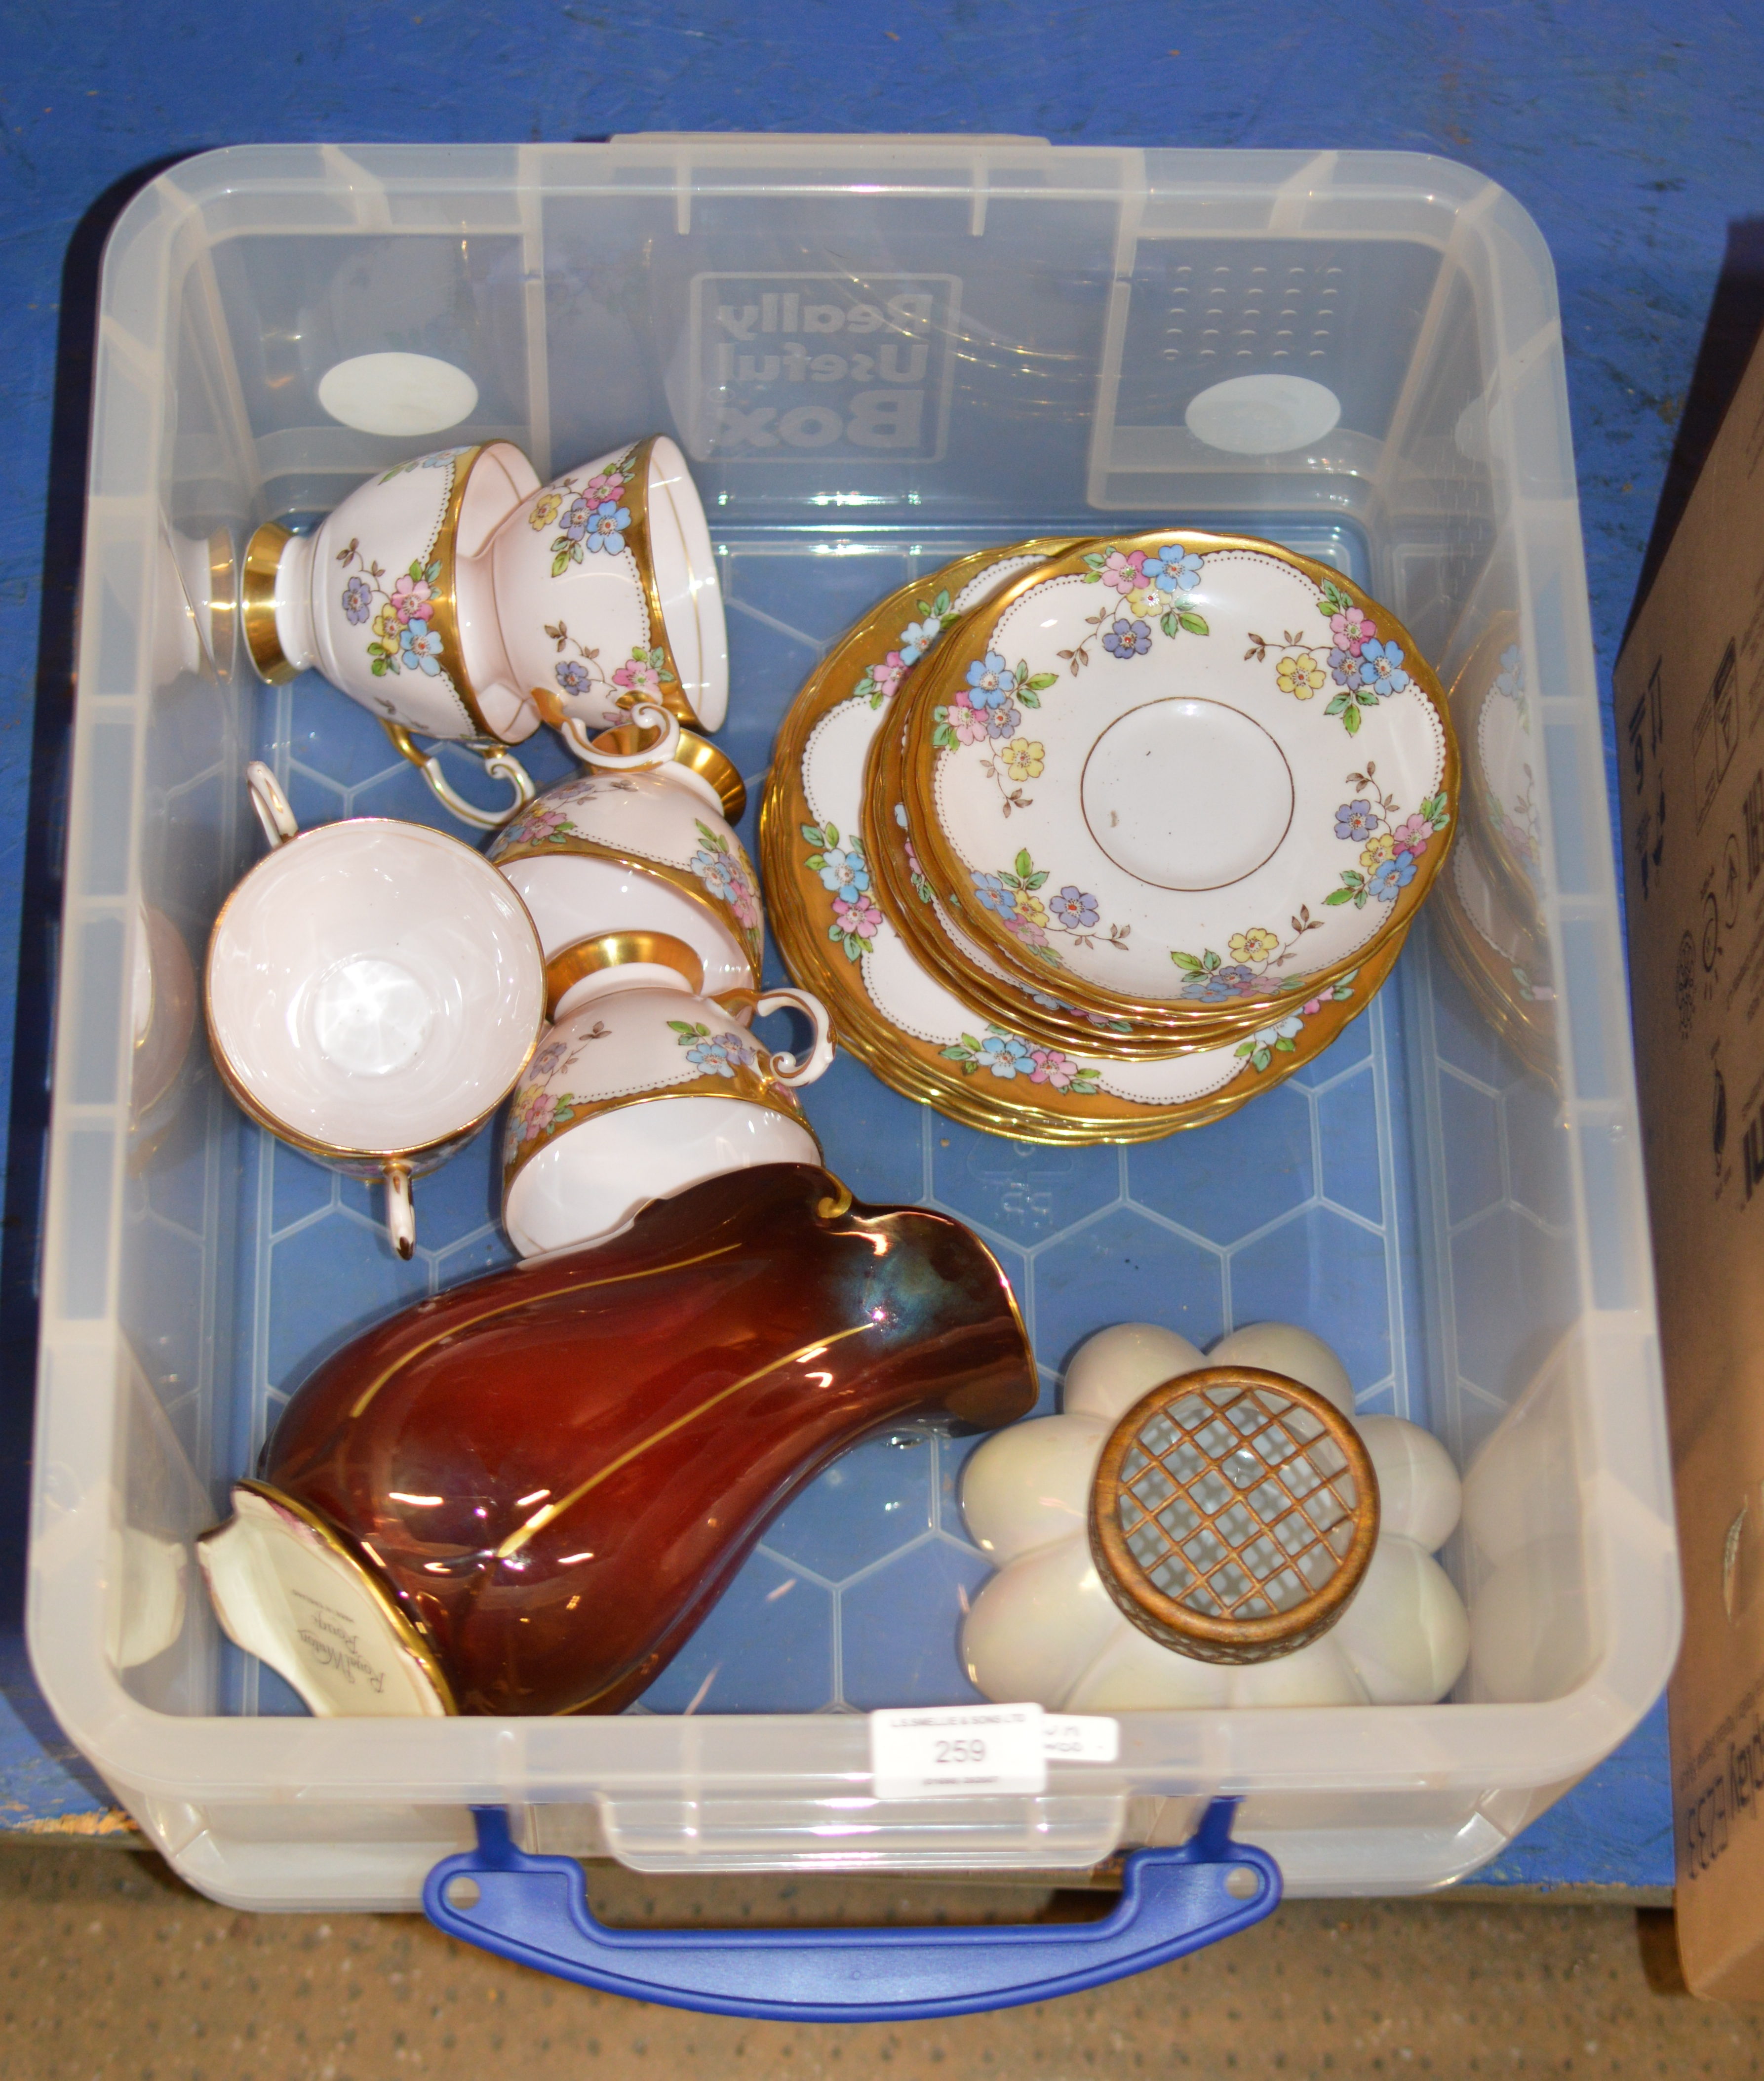 BOX WITH DECORATIVE FLOWER BASKET, ROYAL WINTON JUG & QUANTITY TUSCAN TEA WARE